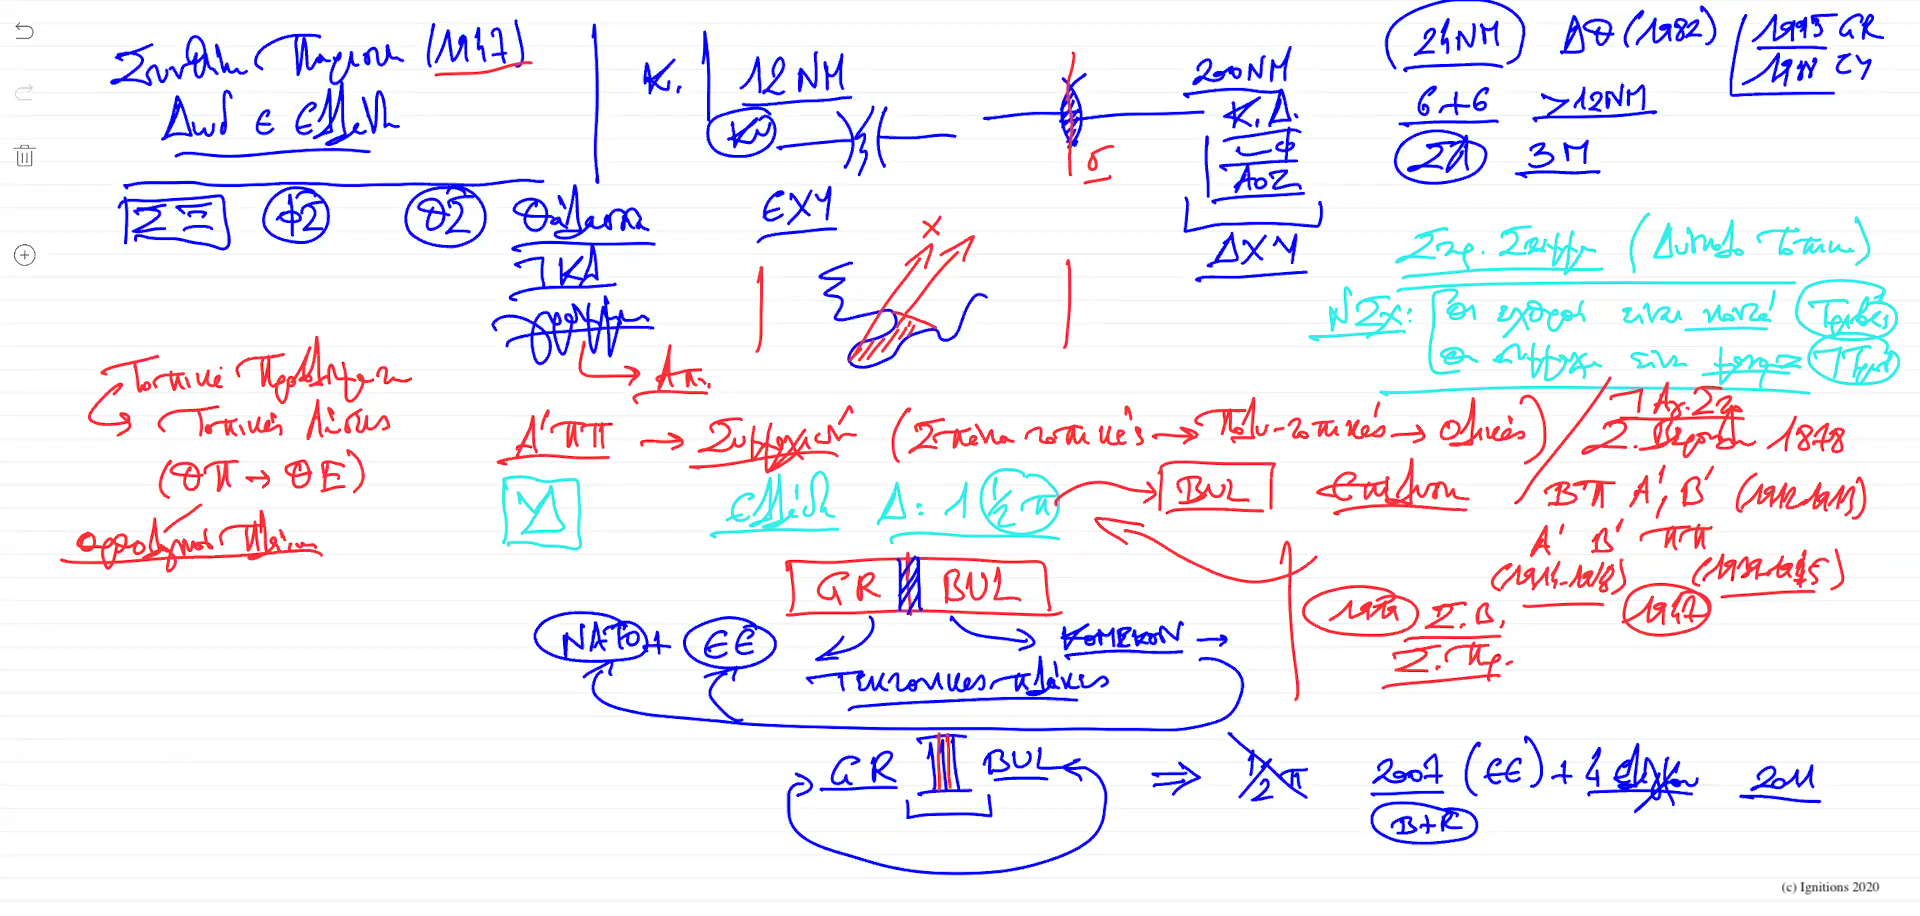 56460 - V - e-Διάλεξη: Ελληνική Γεωστρατηγική II. (Dessin)